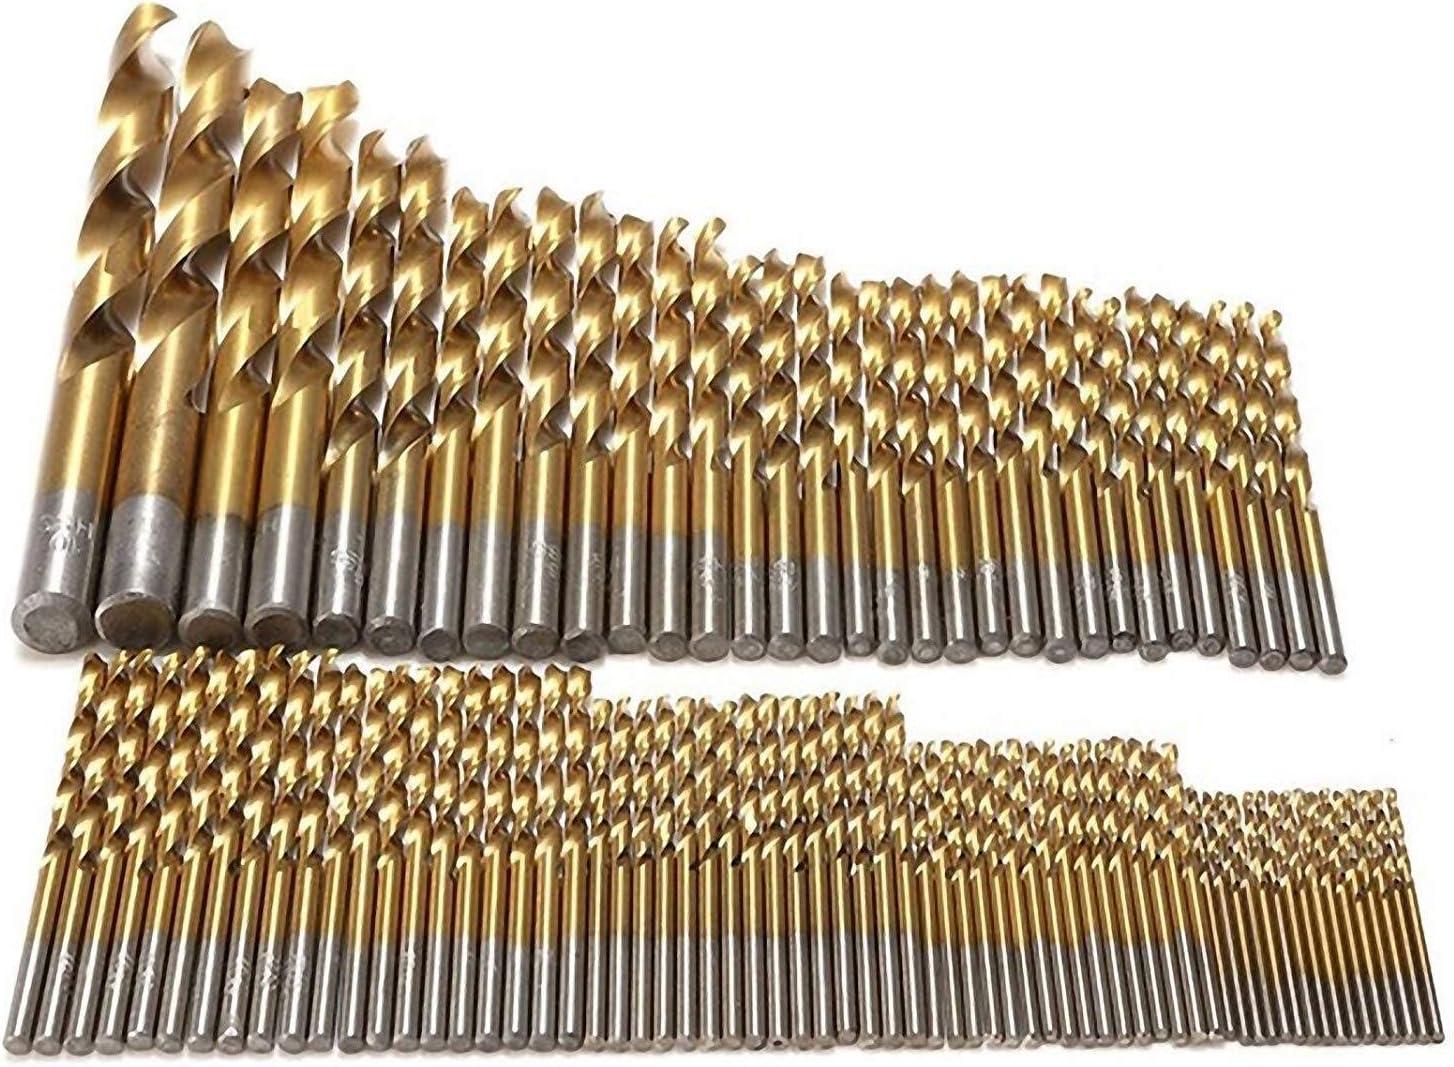 HSS Spiral Edelstahlbohrer Metallbohrer 1-30mm HSS TiN HSS-G HSS-R 1 mm HSS-R 1 St/ück